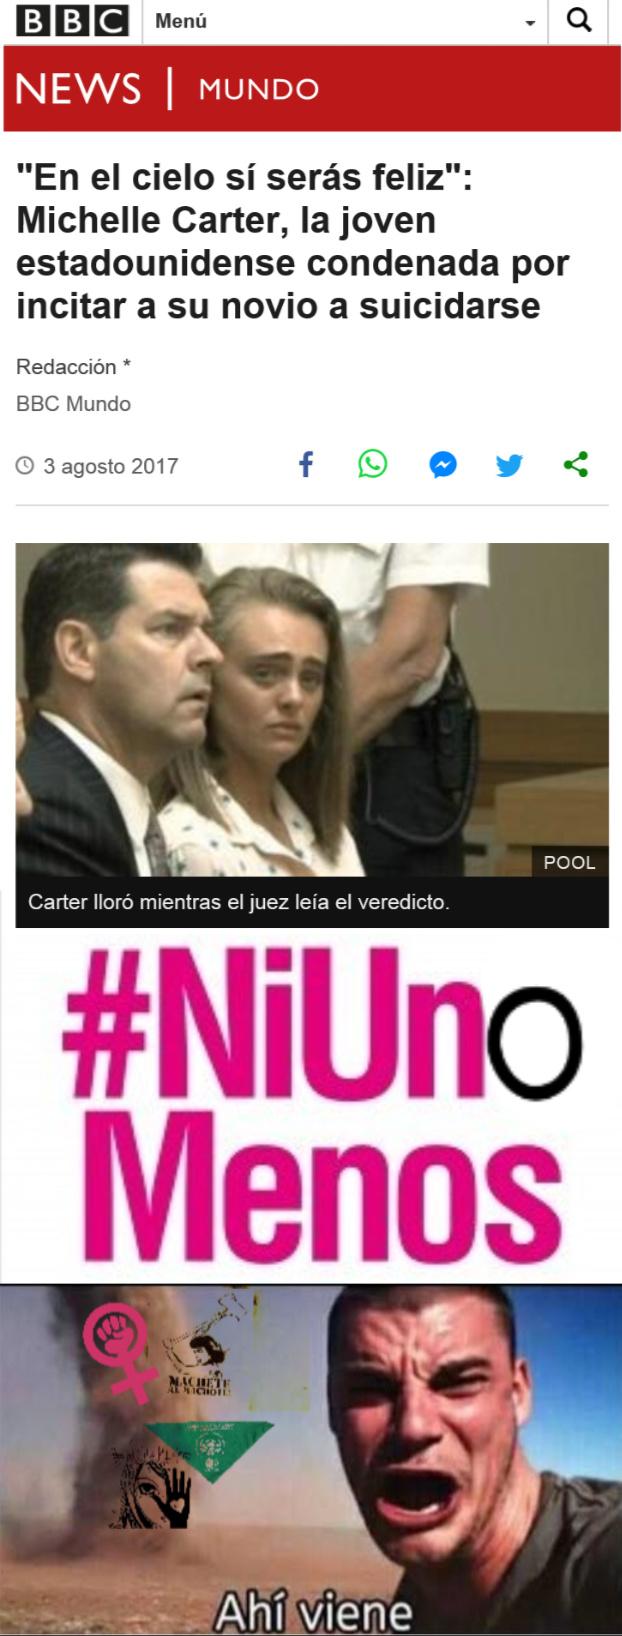 #eltumor - meme